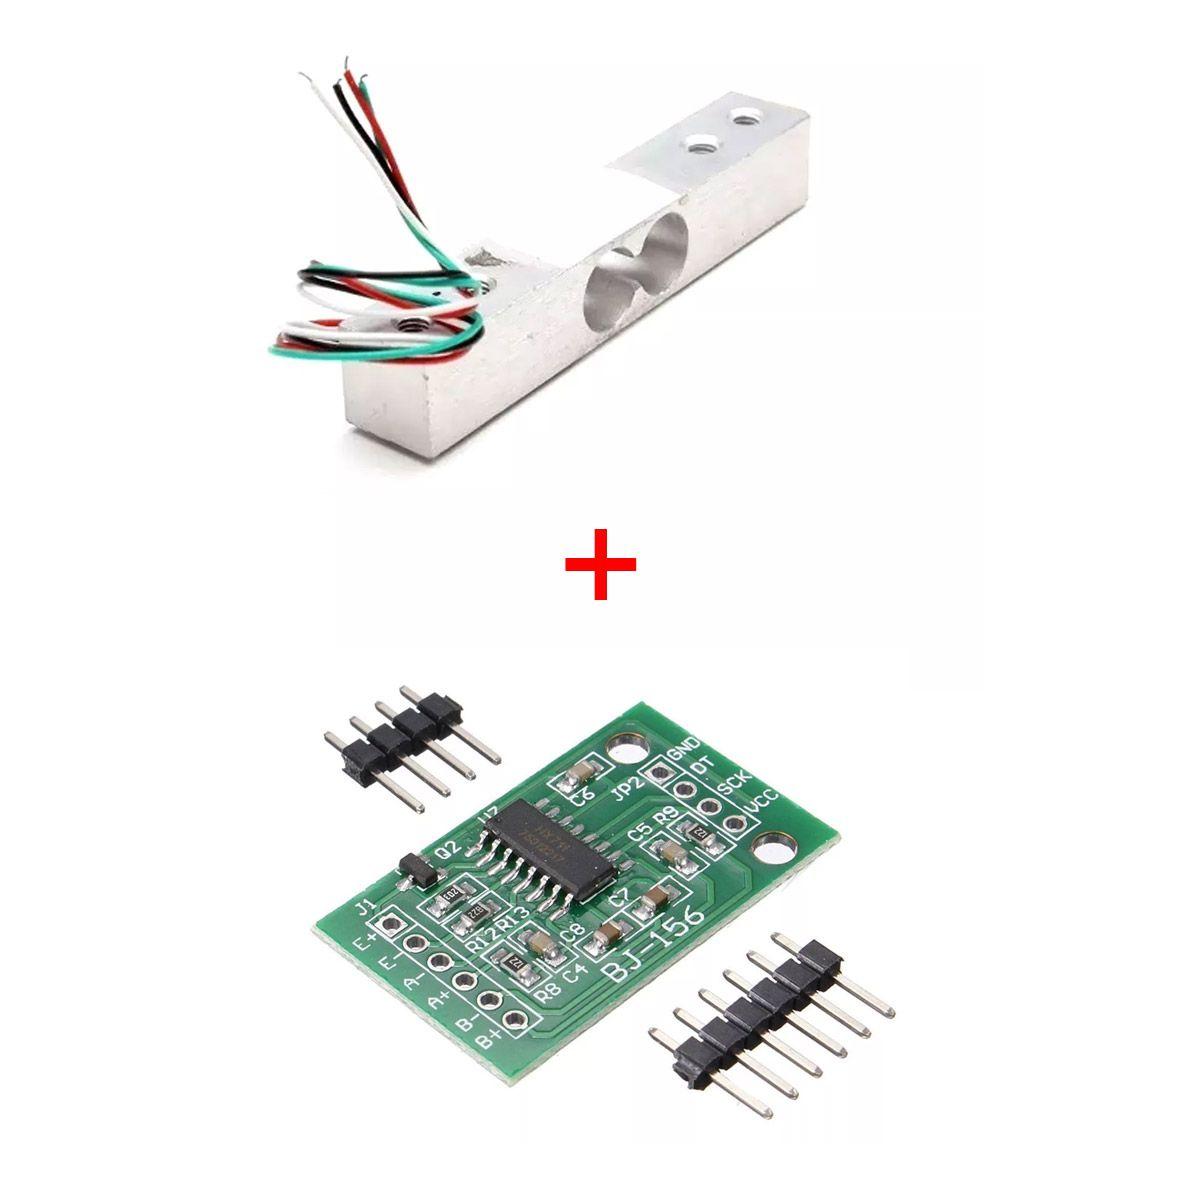 Modulo Hx711 ADC 24 Bits Célula de Carga/Peso +  Celula De Carga 5kg Sensor de Peso Arduino